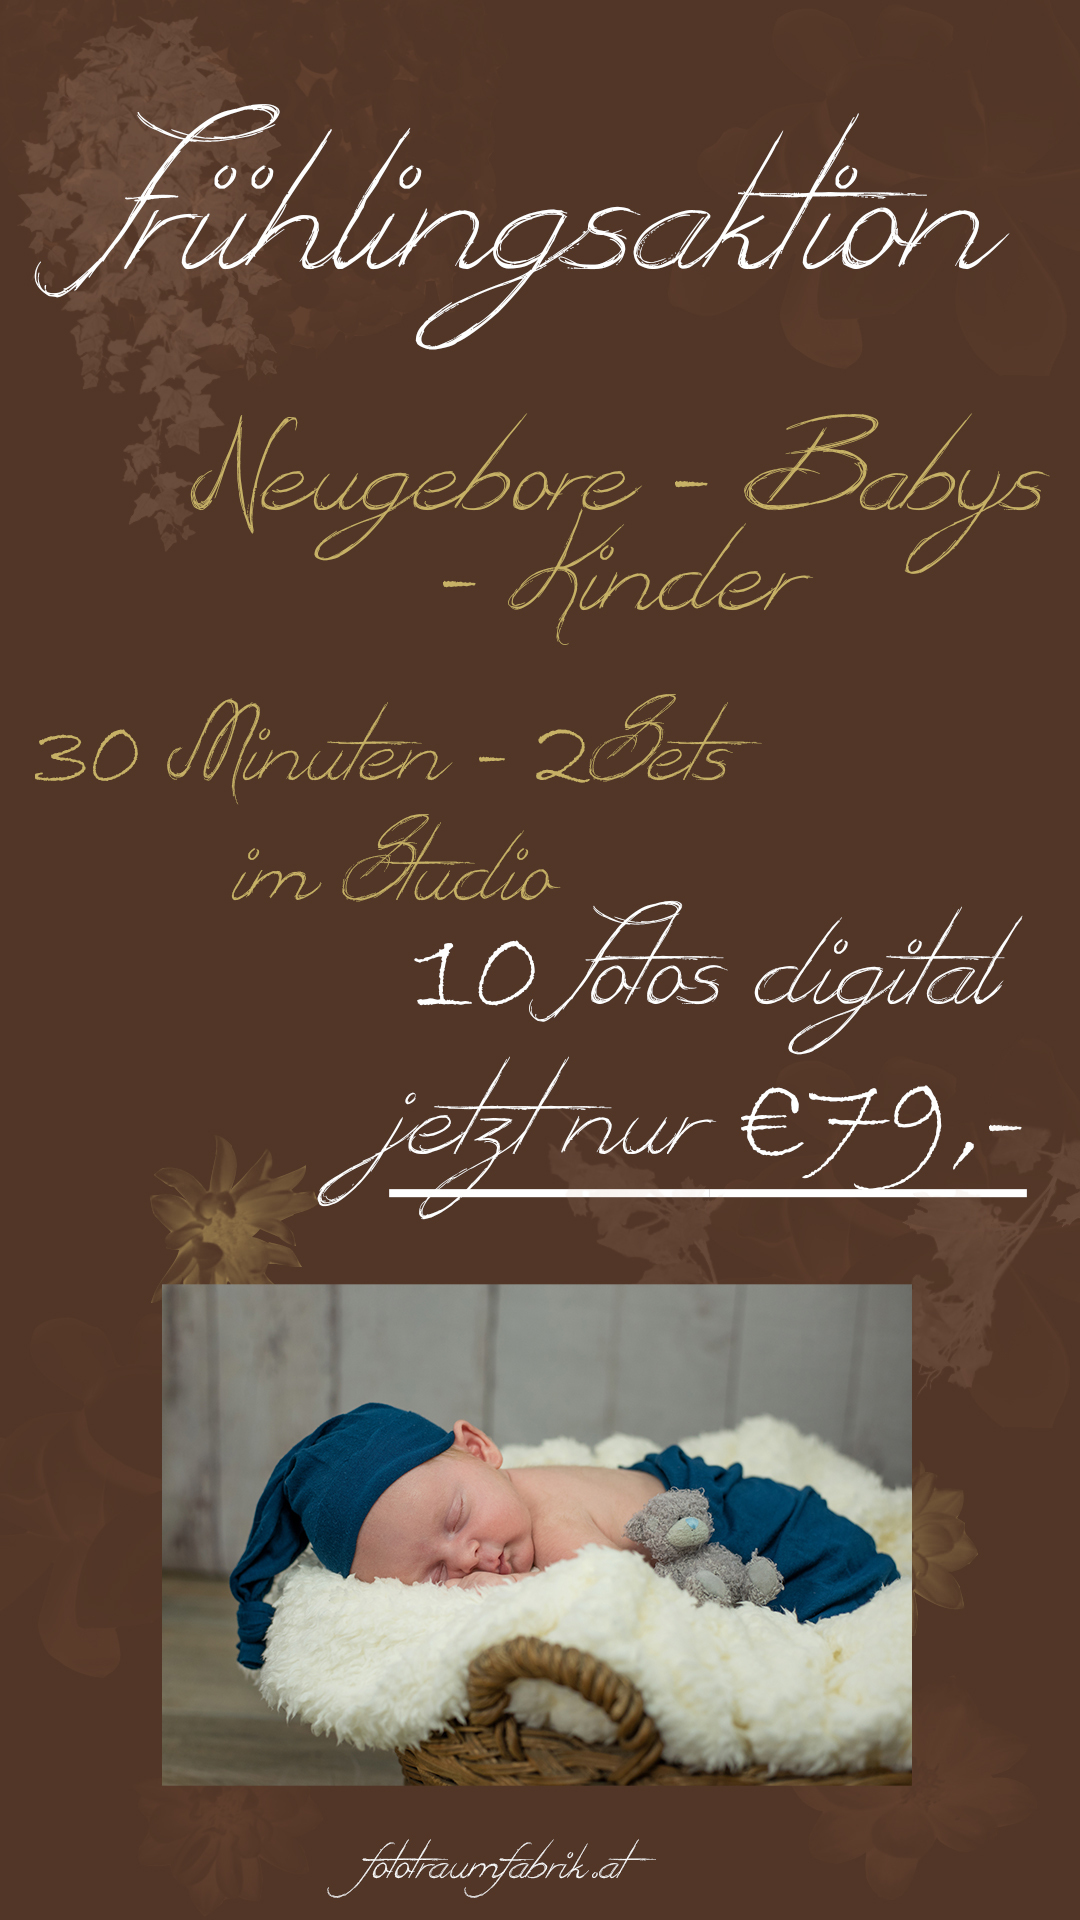 IG_Story_Aktion_NewbornBabyKinder_Fruehlingsaktion